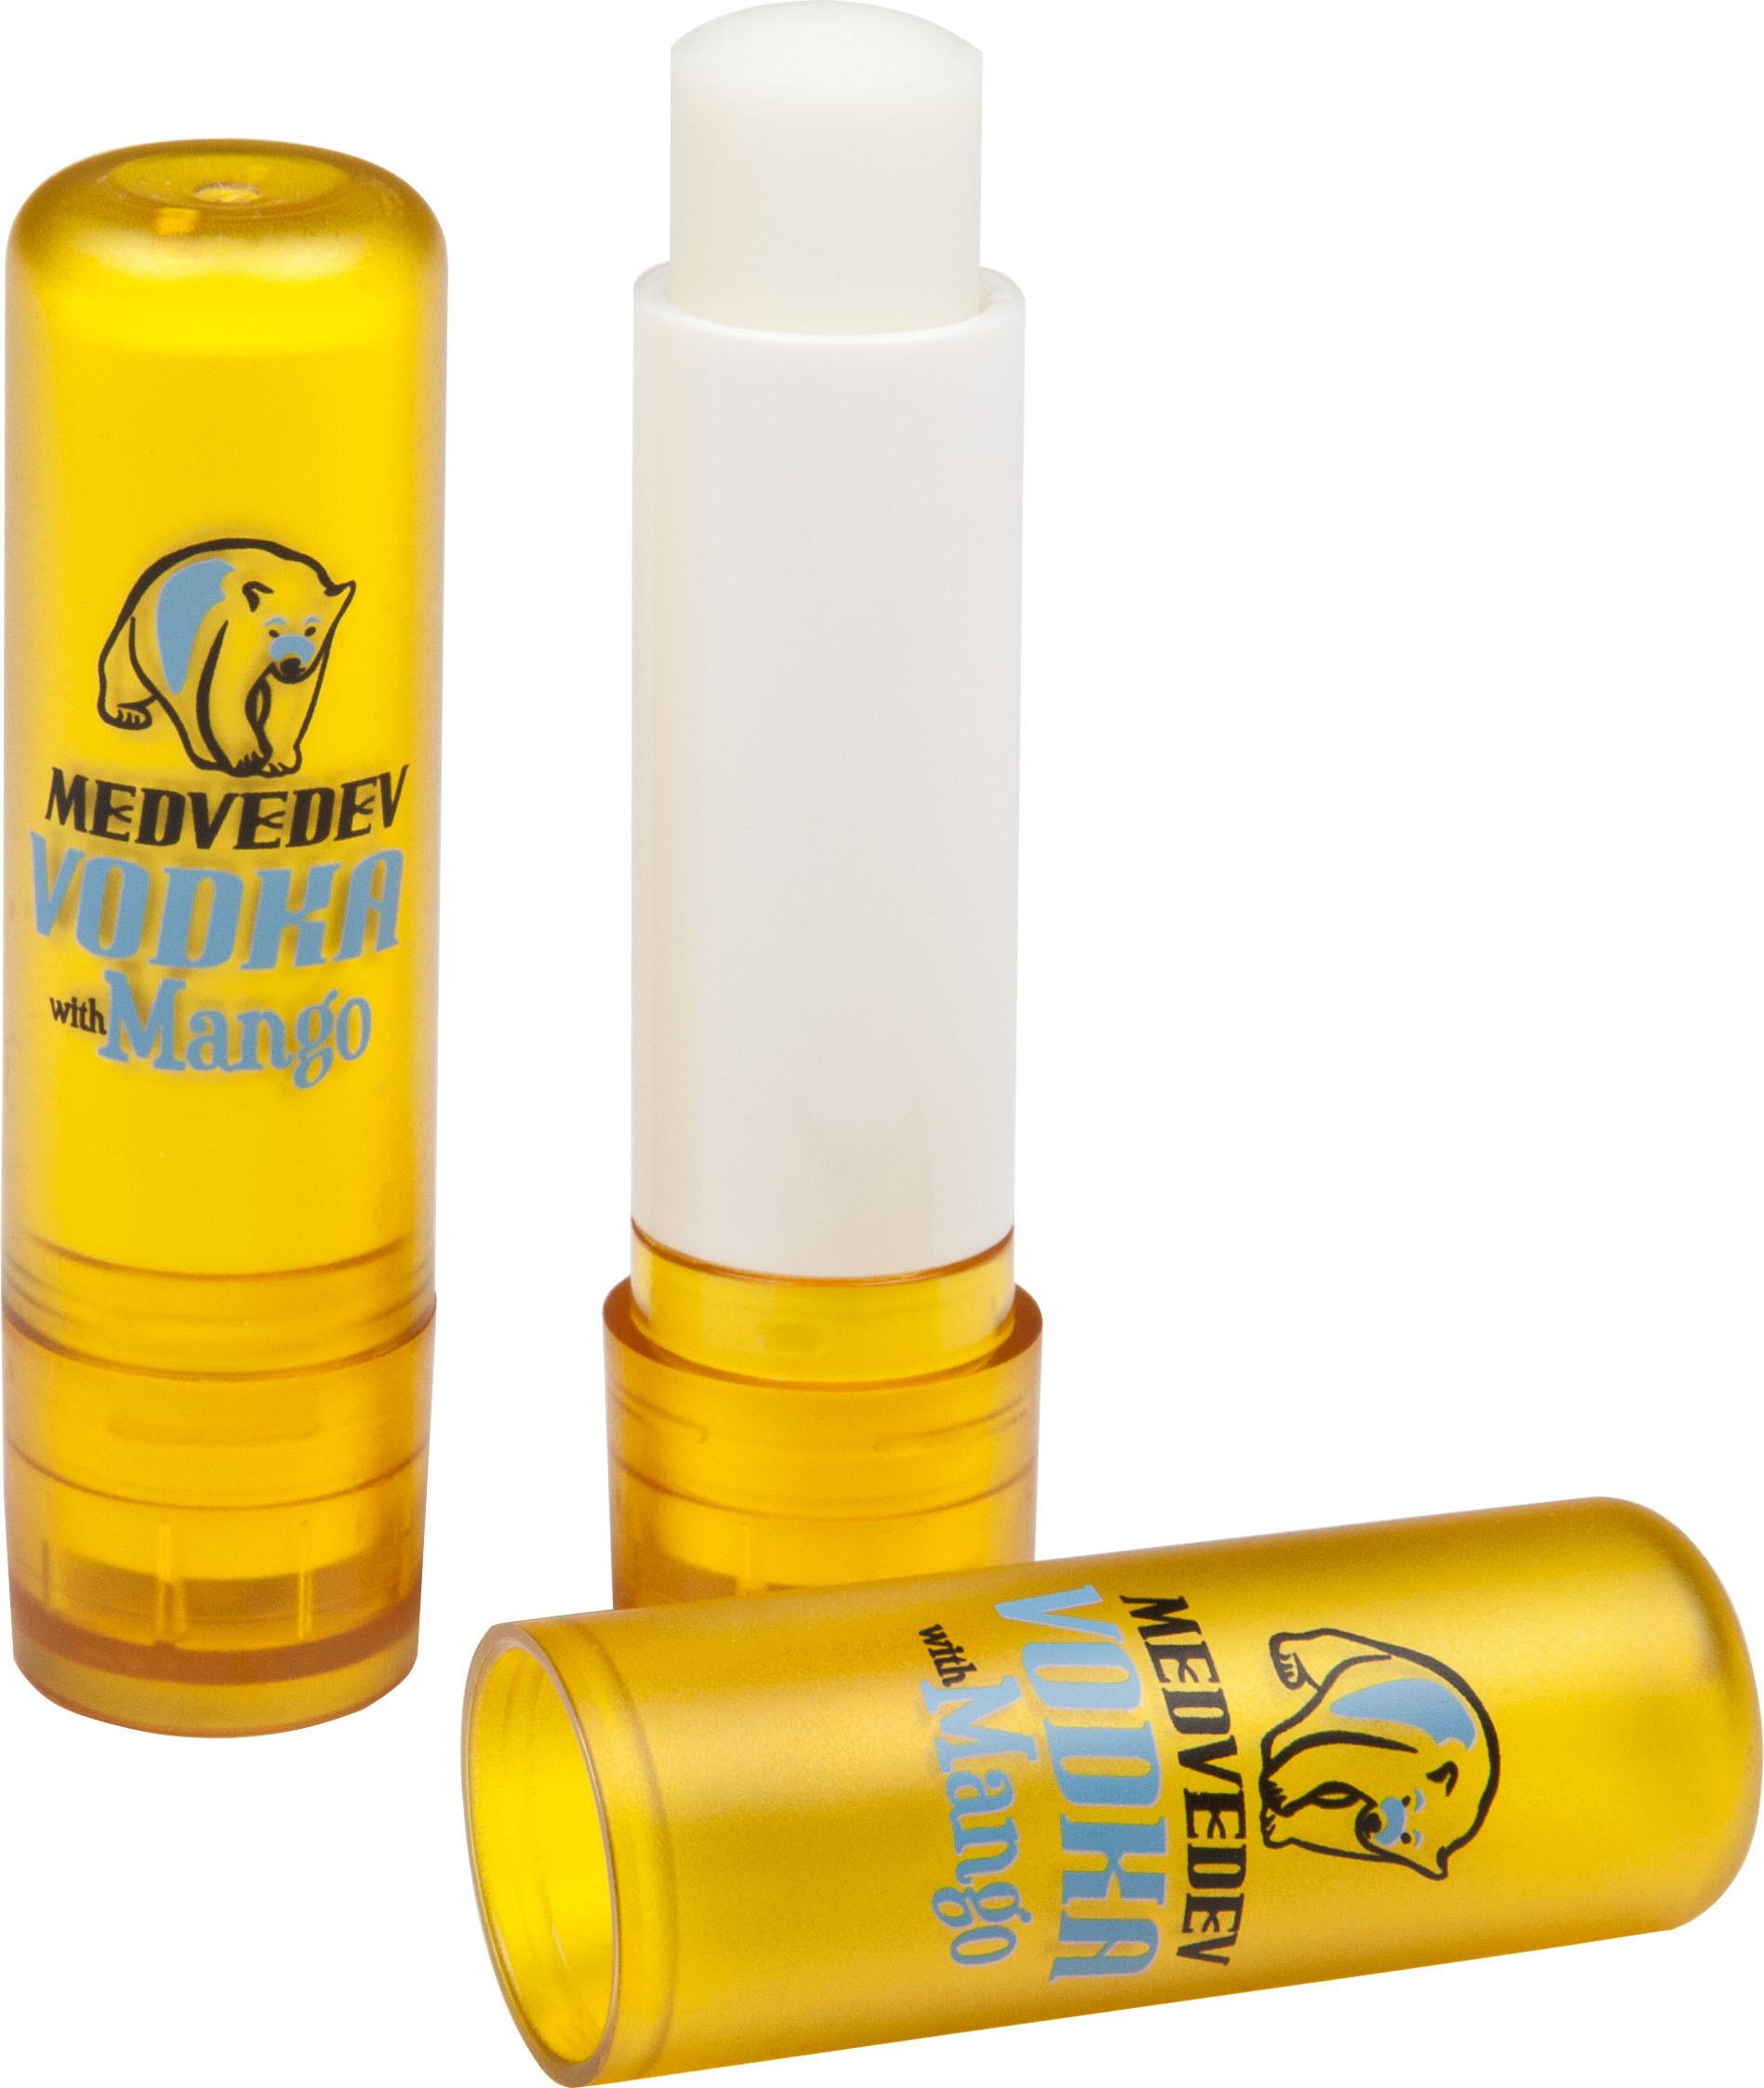 Lippenpflegestift mit individueller Bedruckung